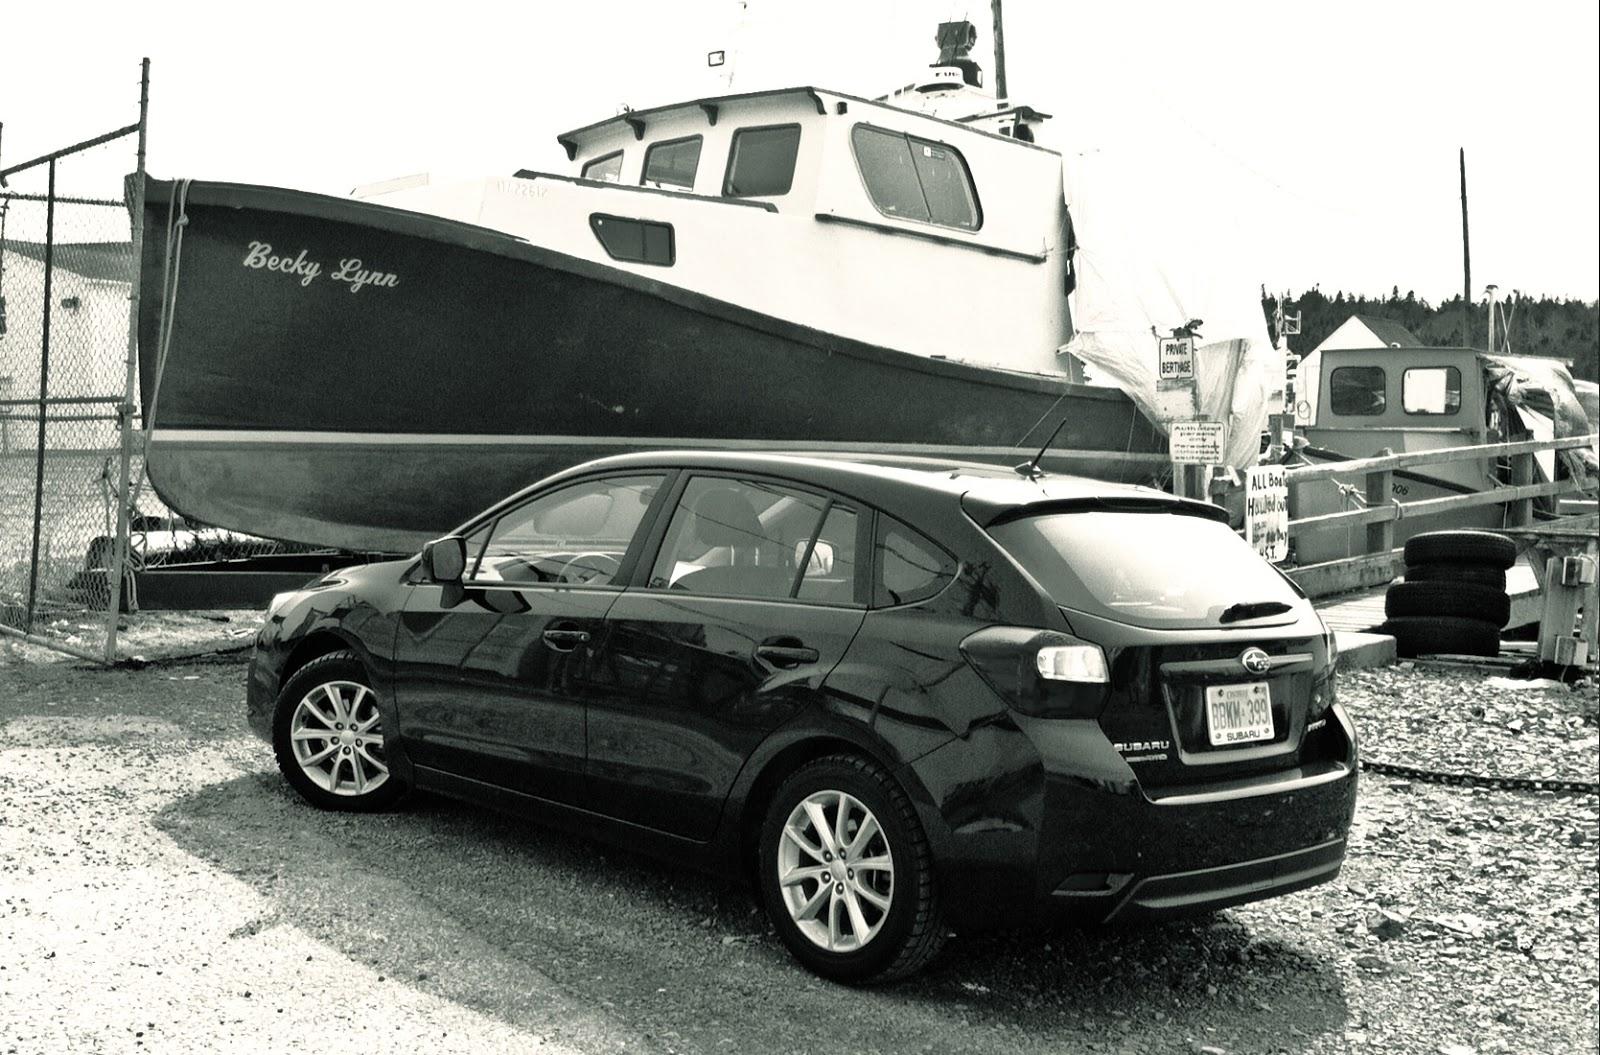 2014 Subaru Impreza hatchback Touring rear